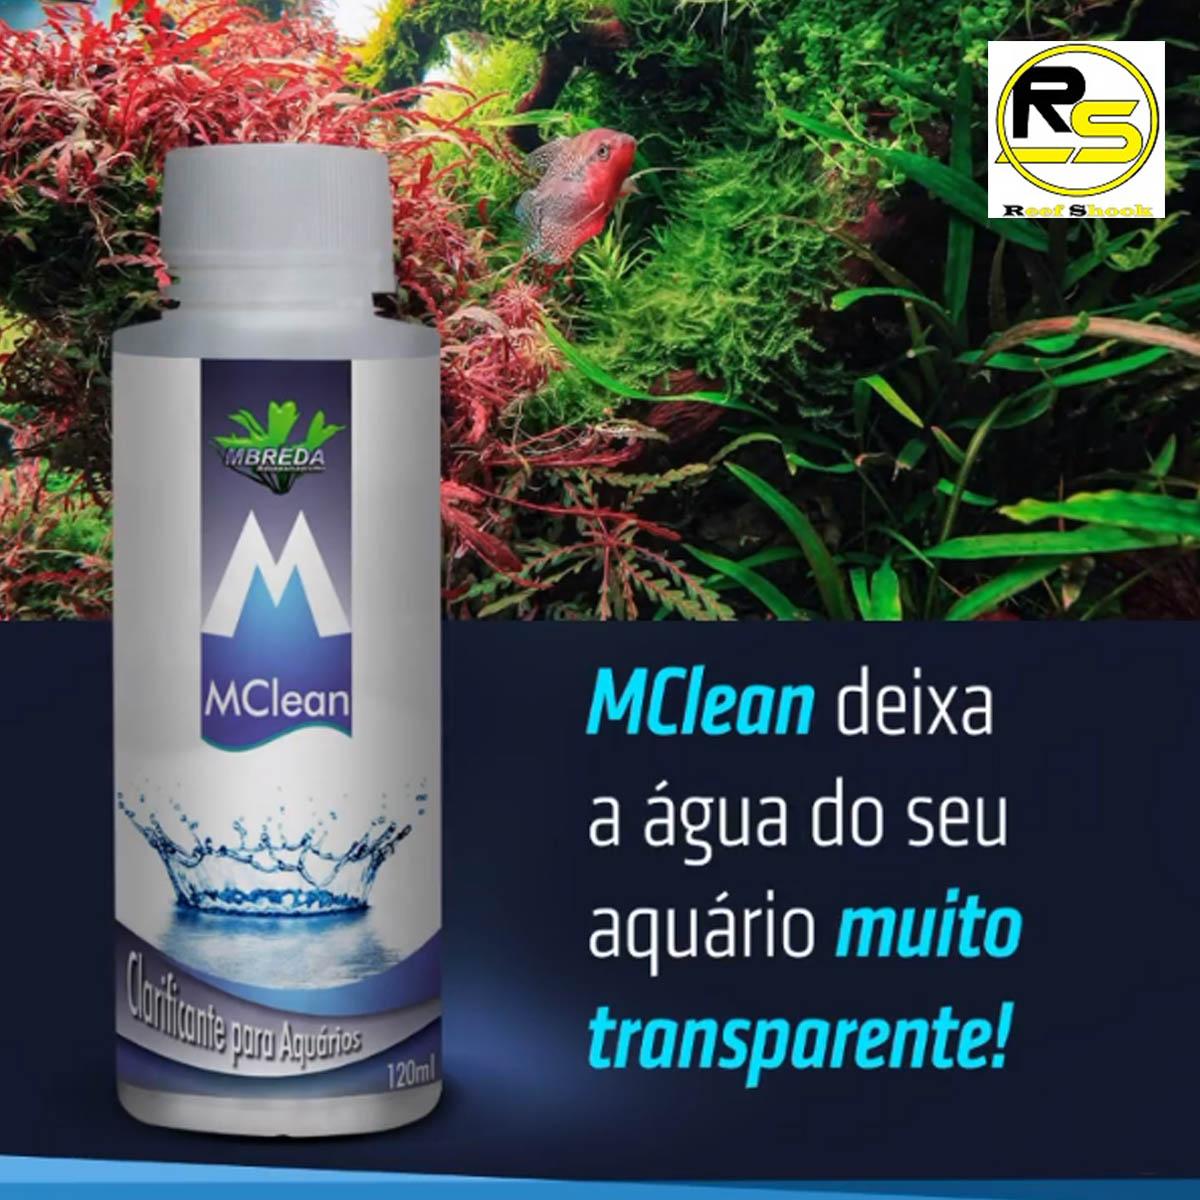 Clarificante Mclean Mbreda para Aquario 500ml